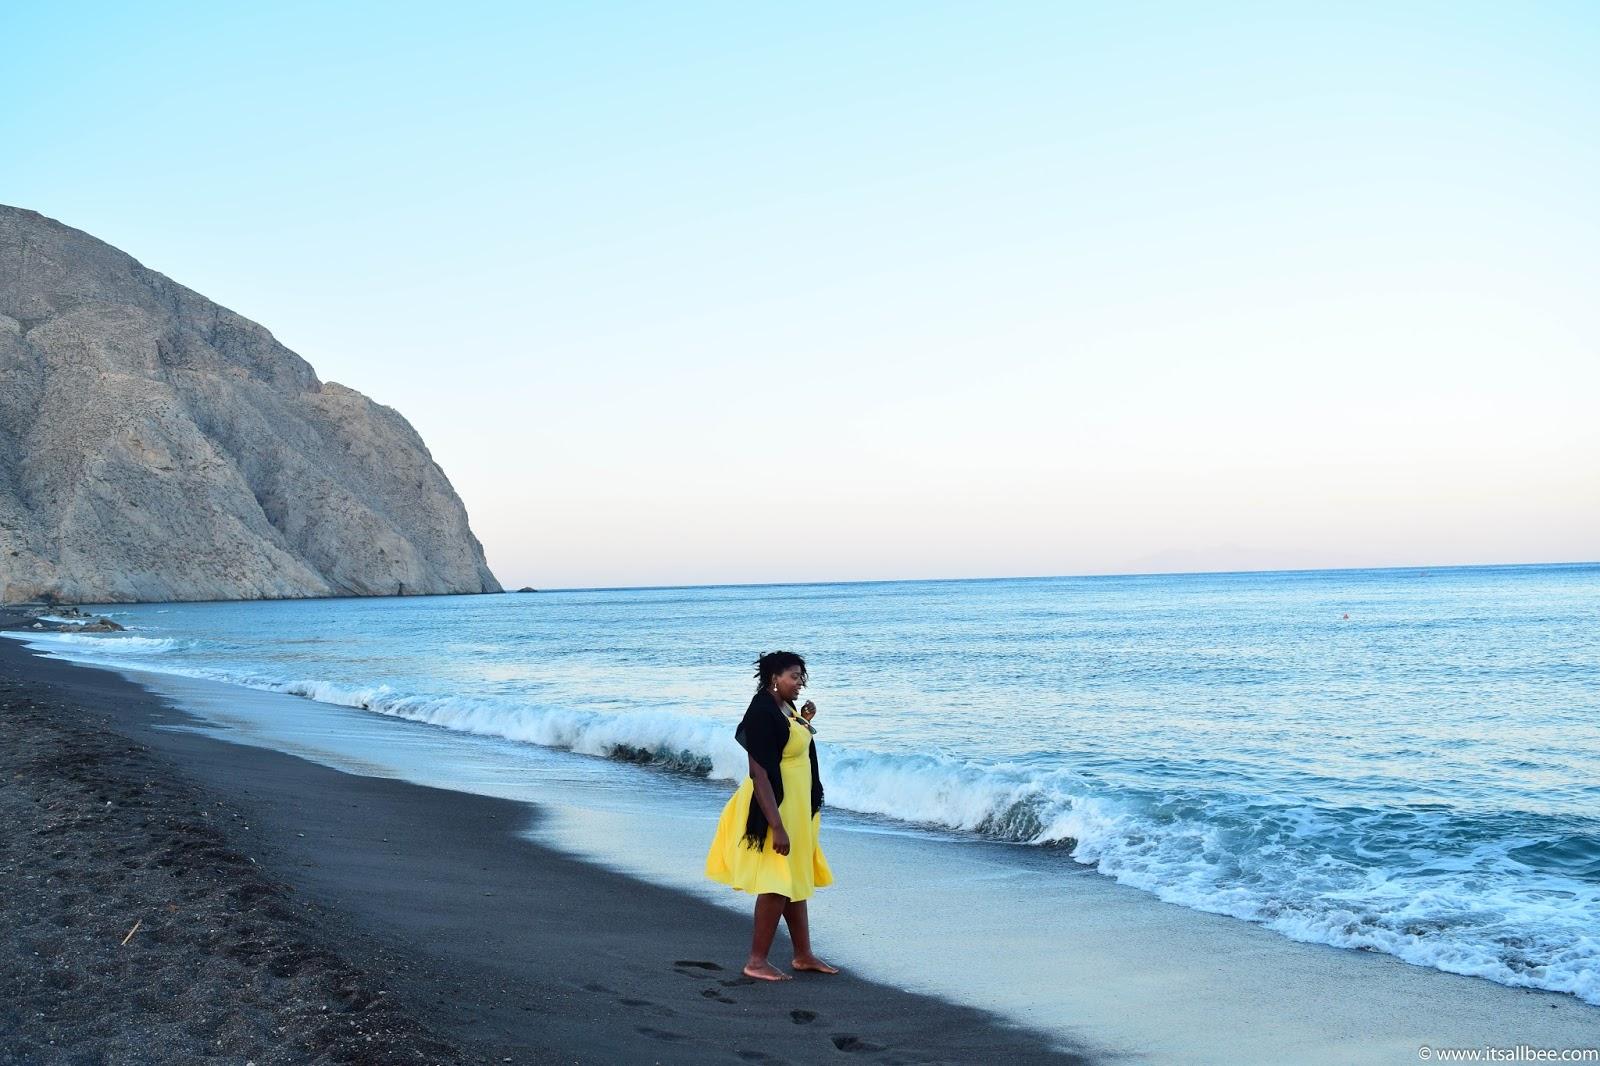 Best Santorini beaches | Guide To The Best of Santorini Beaches